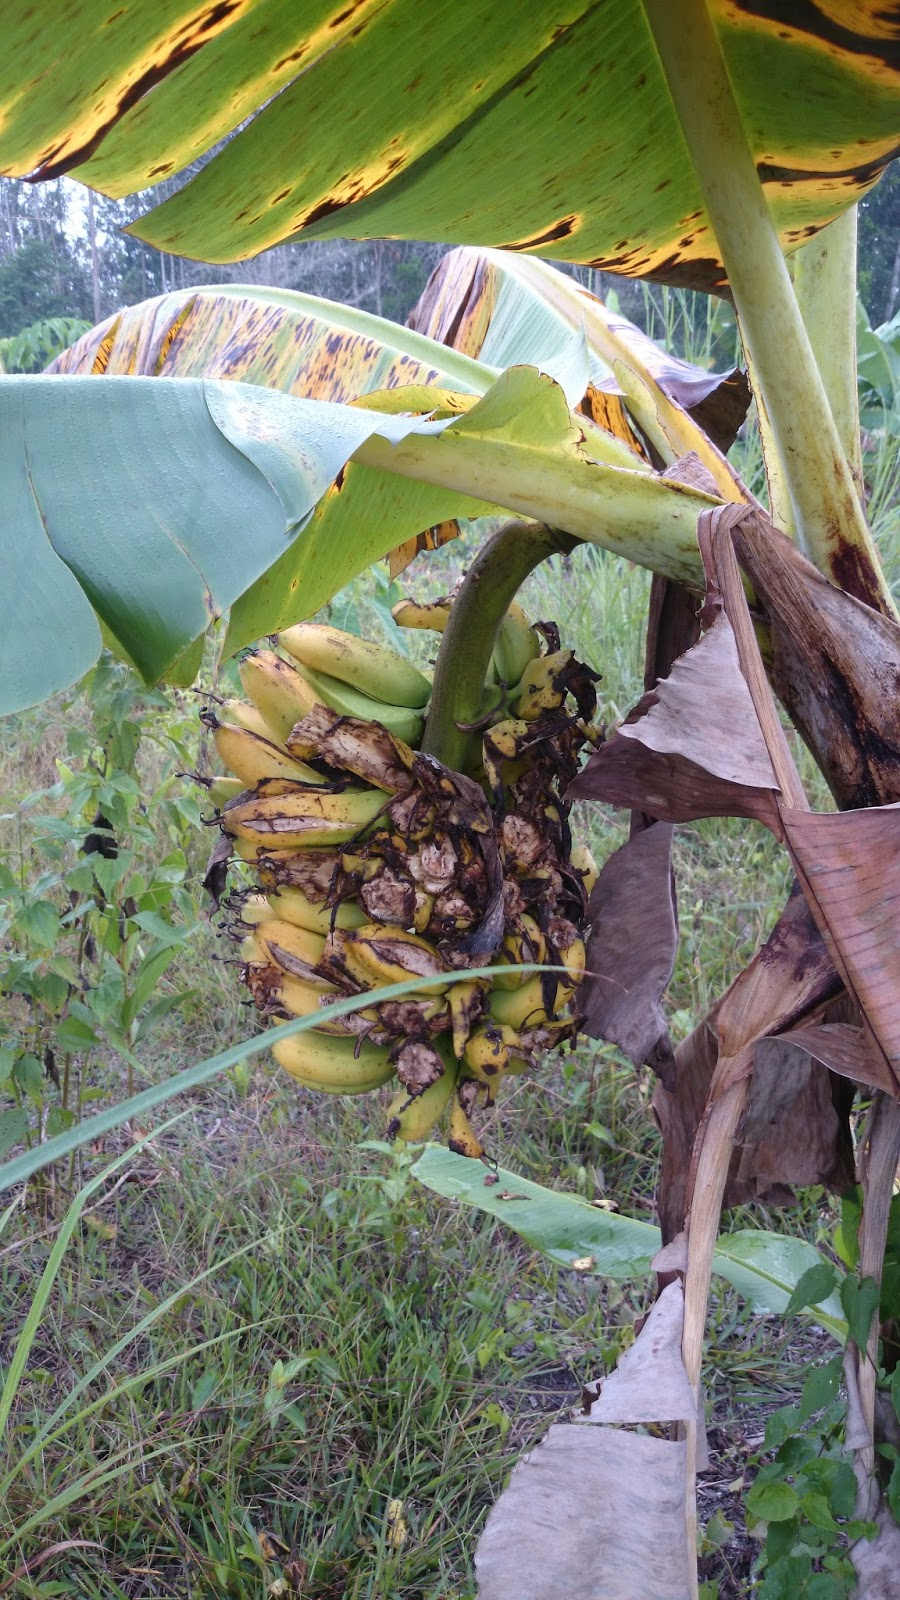 Tuaian Sayuran Dan Buah Pertengahan Tahun Di Kg Kebun Getah Bawang Dayak Segar Setengah Kilo Pokok Pisang Atas Sudah Mula Masak Dituai Lebih Dulu Oleh Binatang Liar Mungkin Burung Yang Tinggal Berhampiran